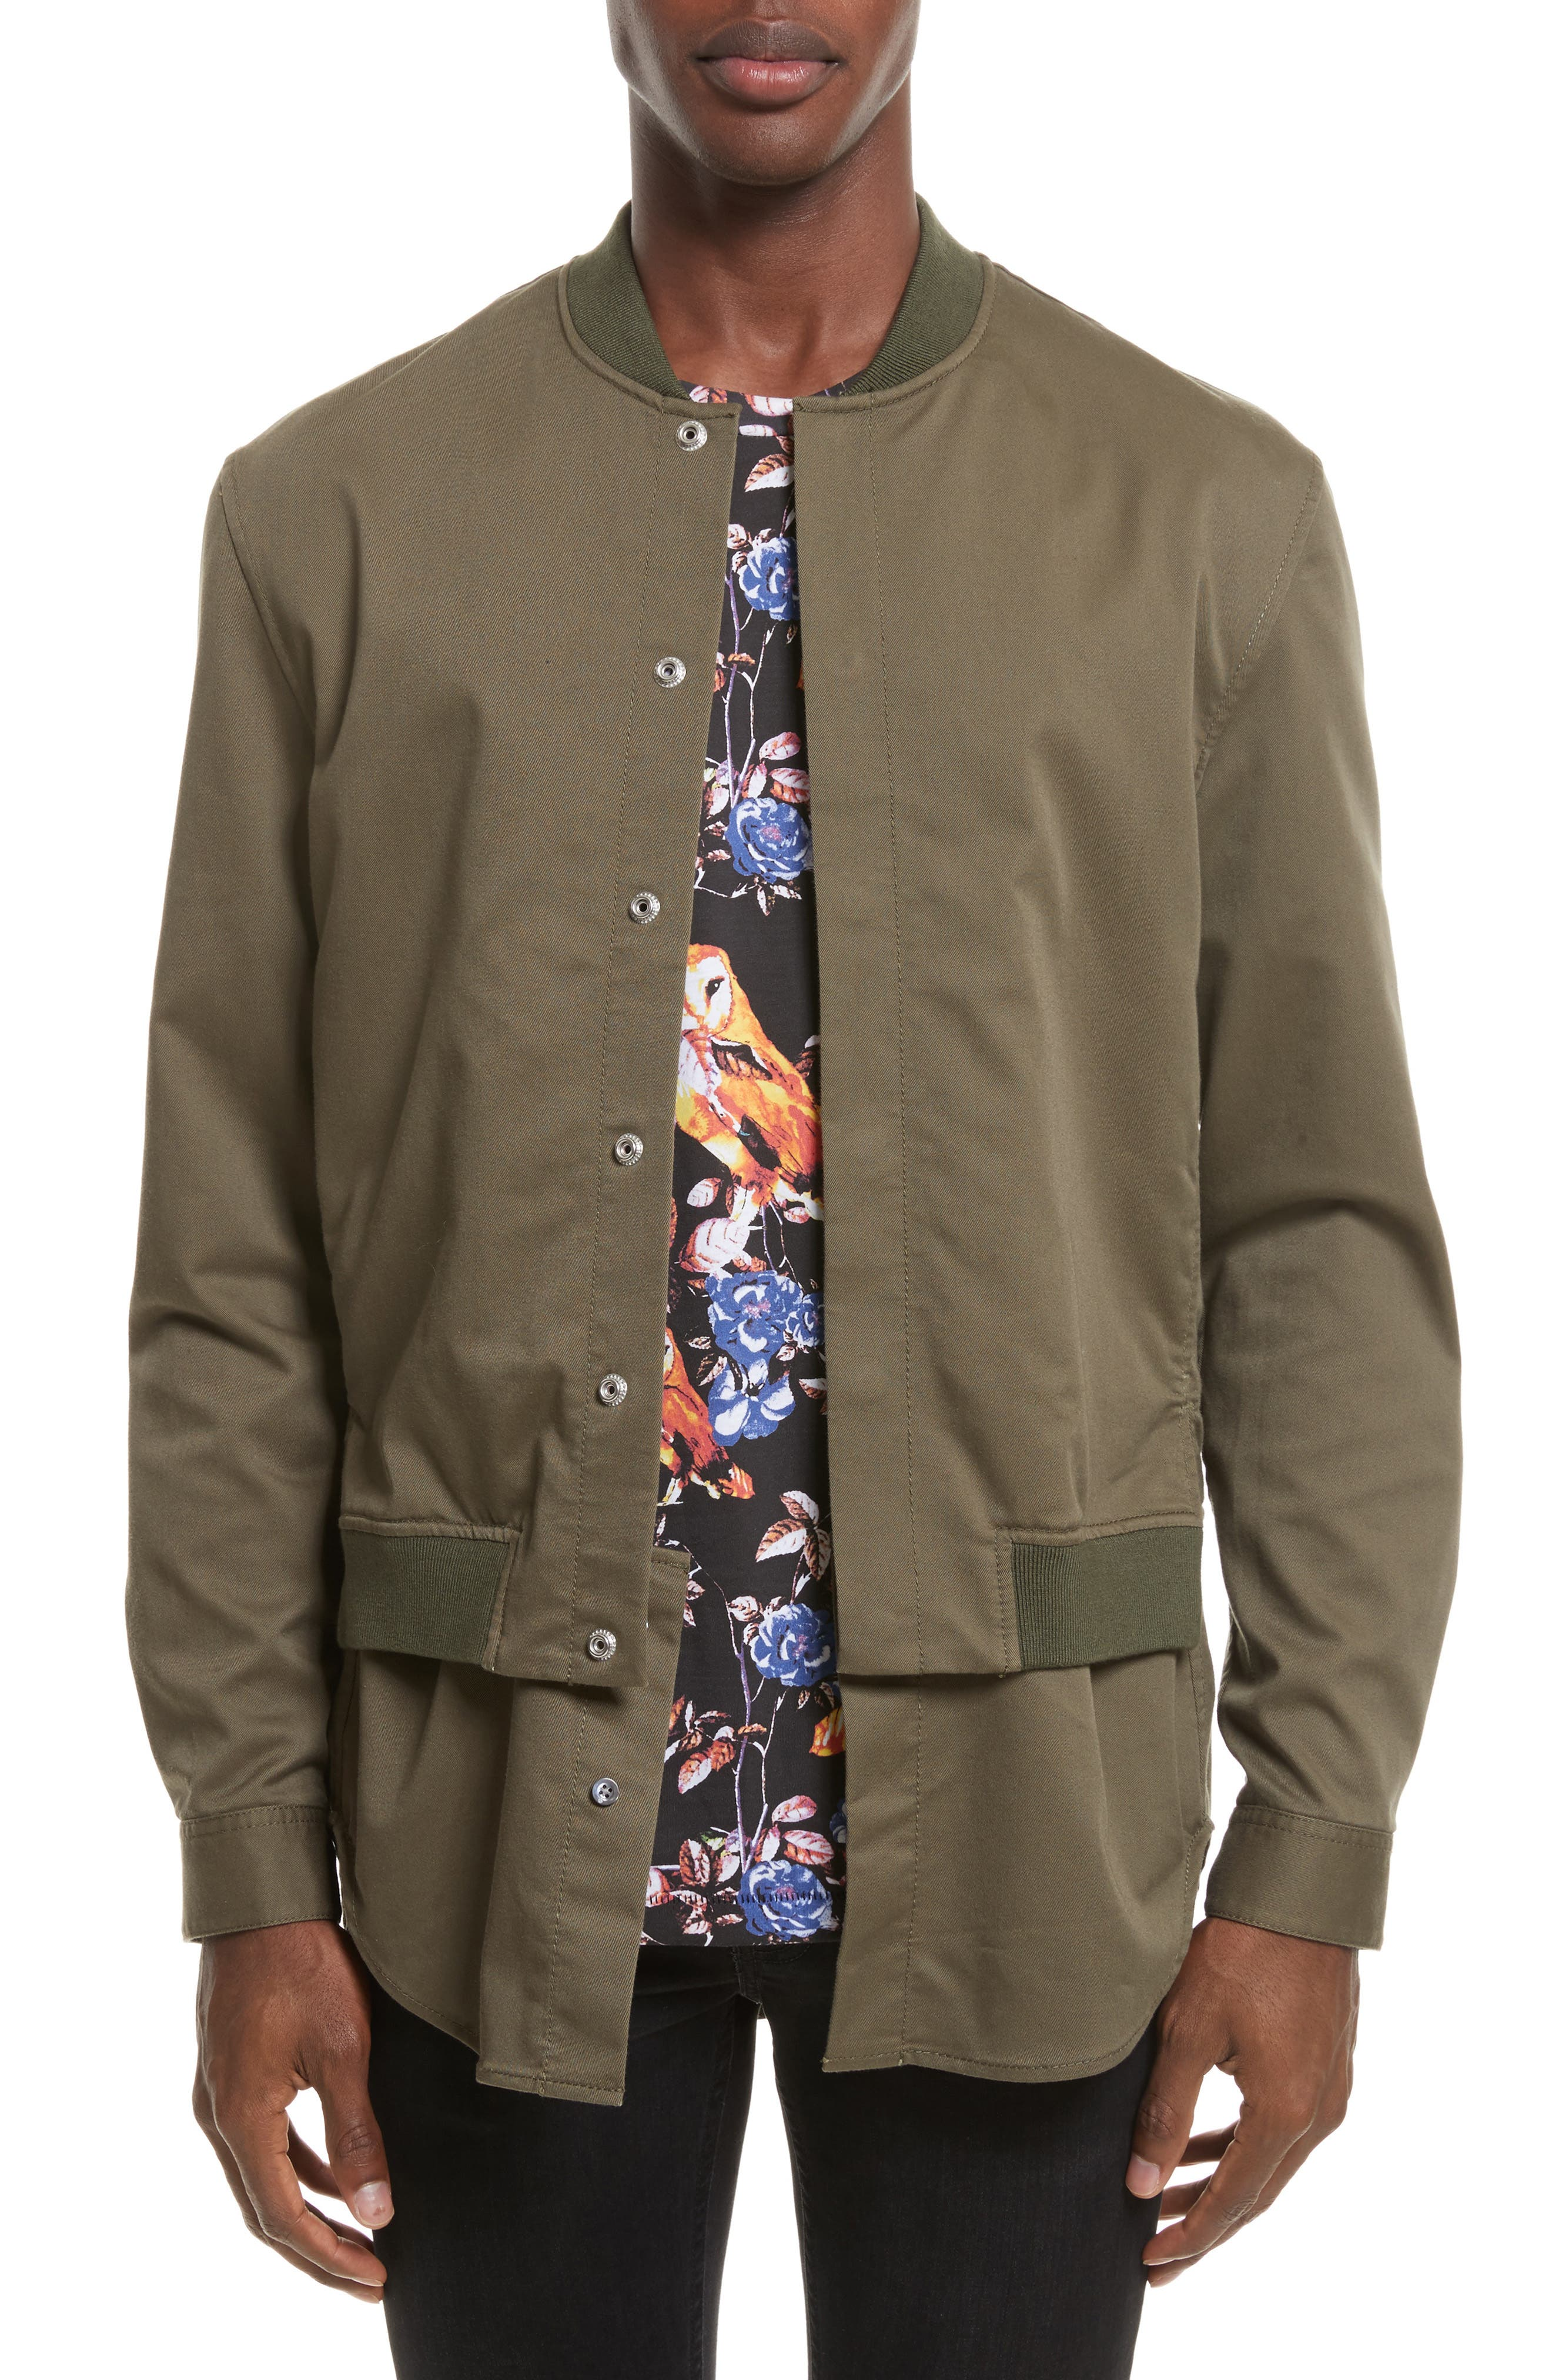 Alternate Image 1 Selected - 3.1 Phillip Lim Bomber Shirt Jacket